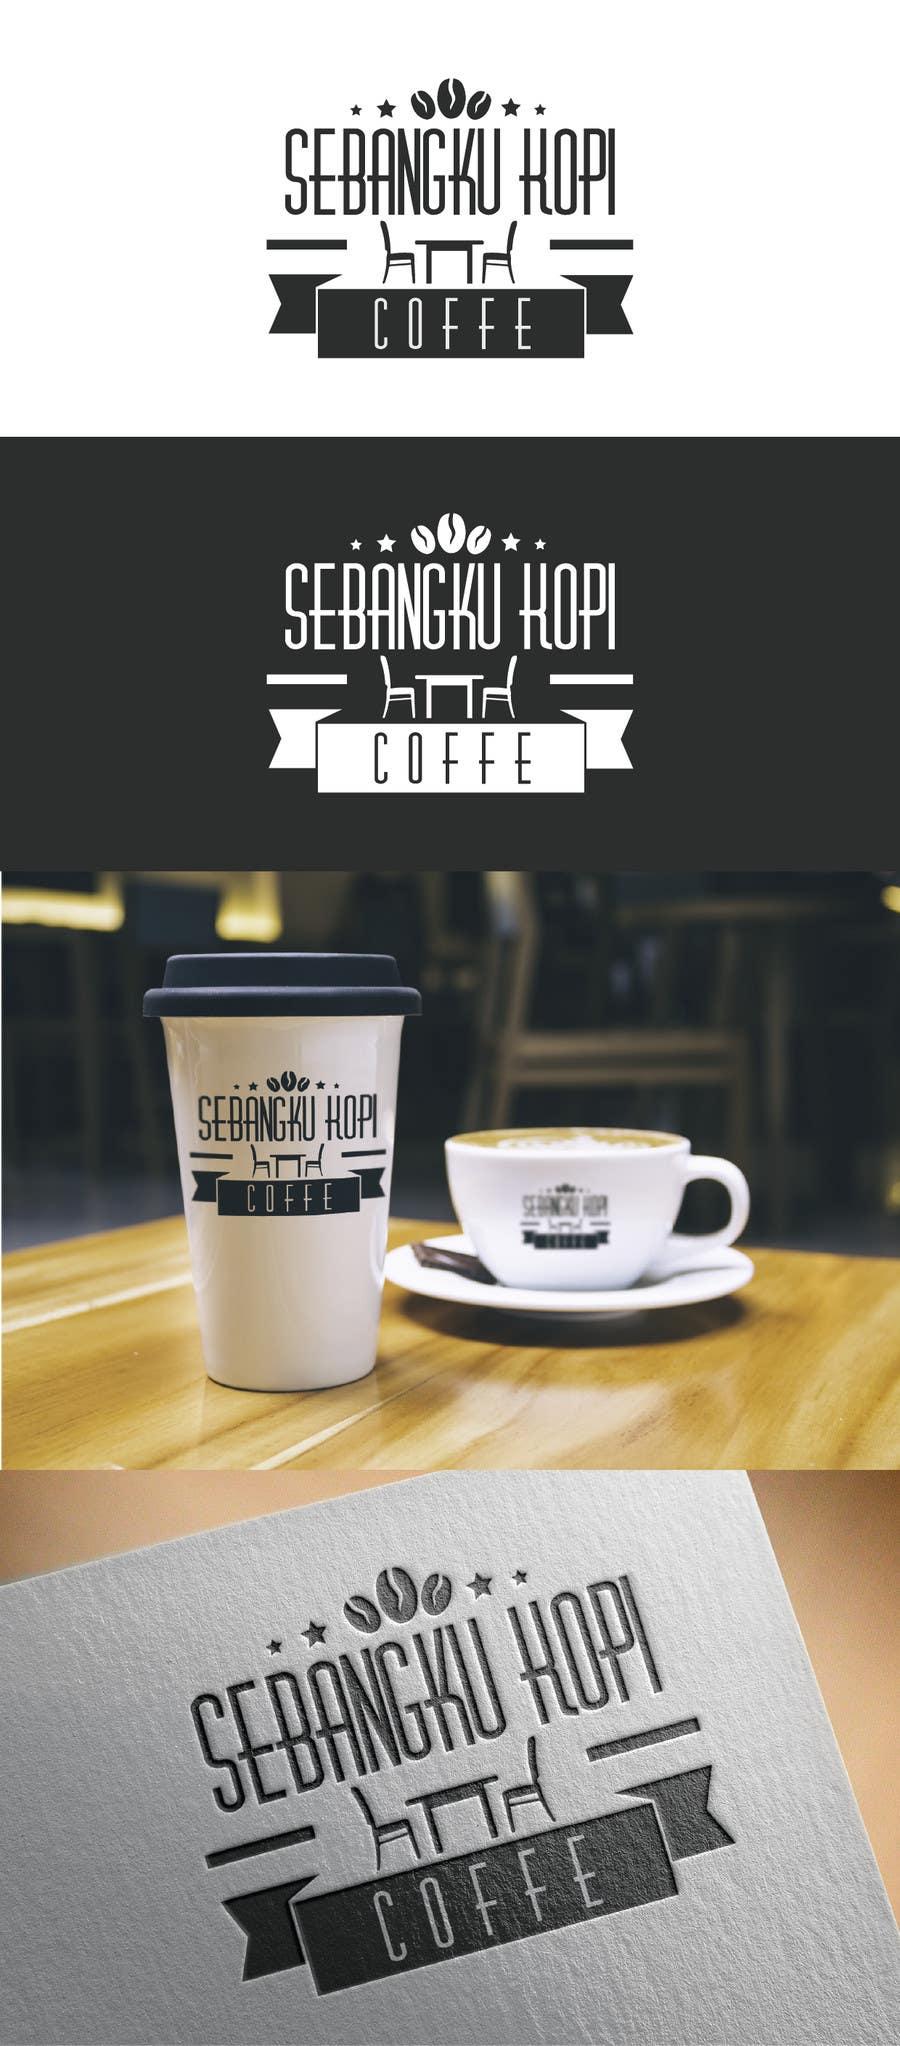 Konkurrenceindlæg #49 for Logo Design for Our Brand New Coffee Shop